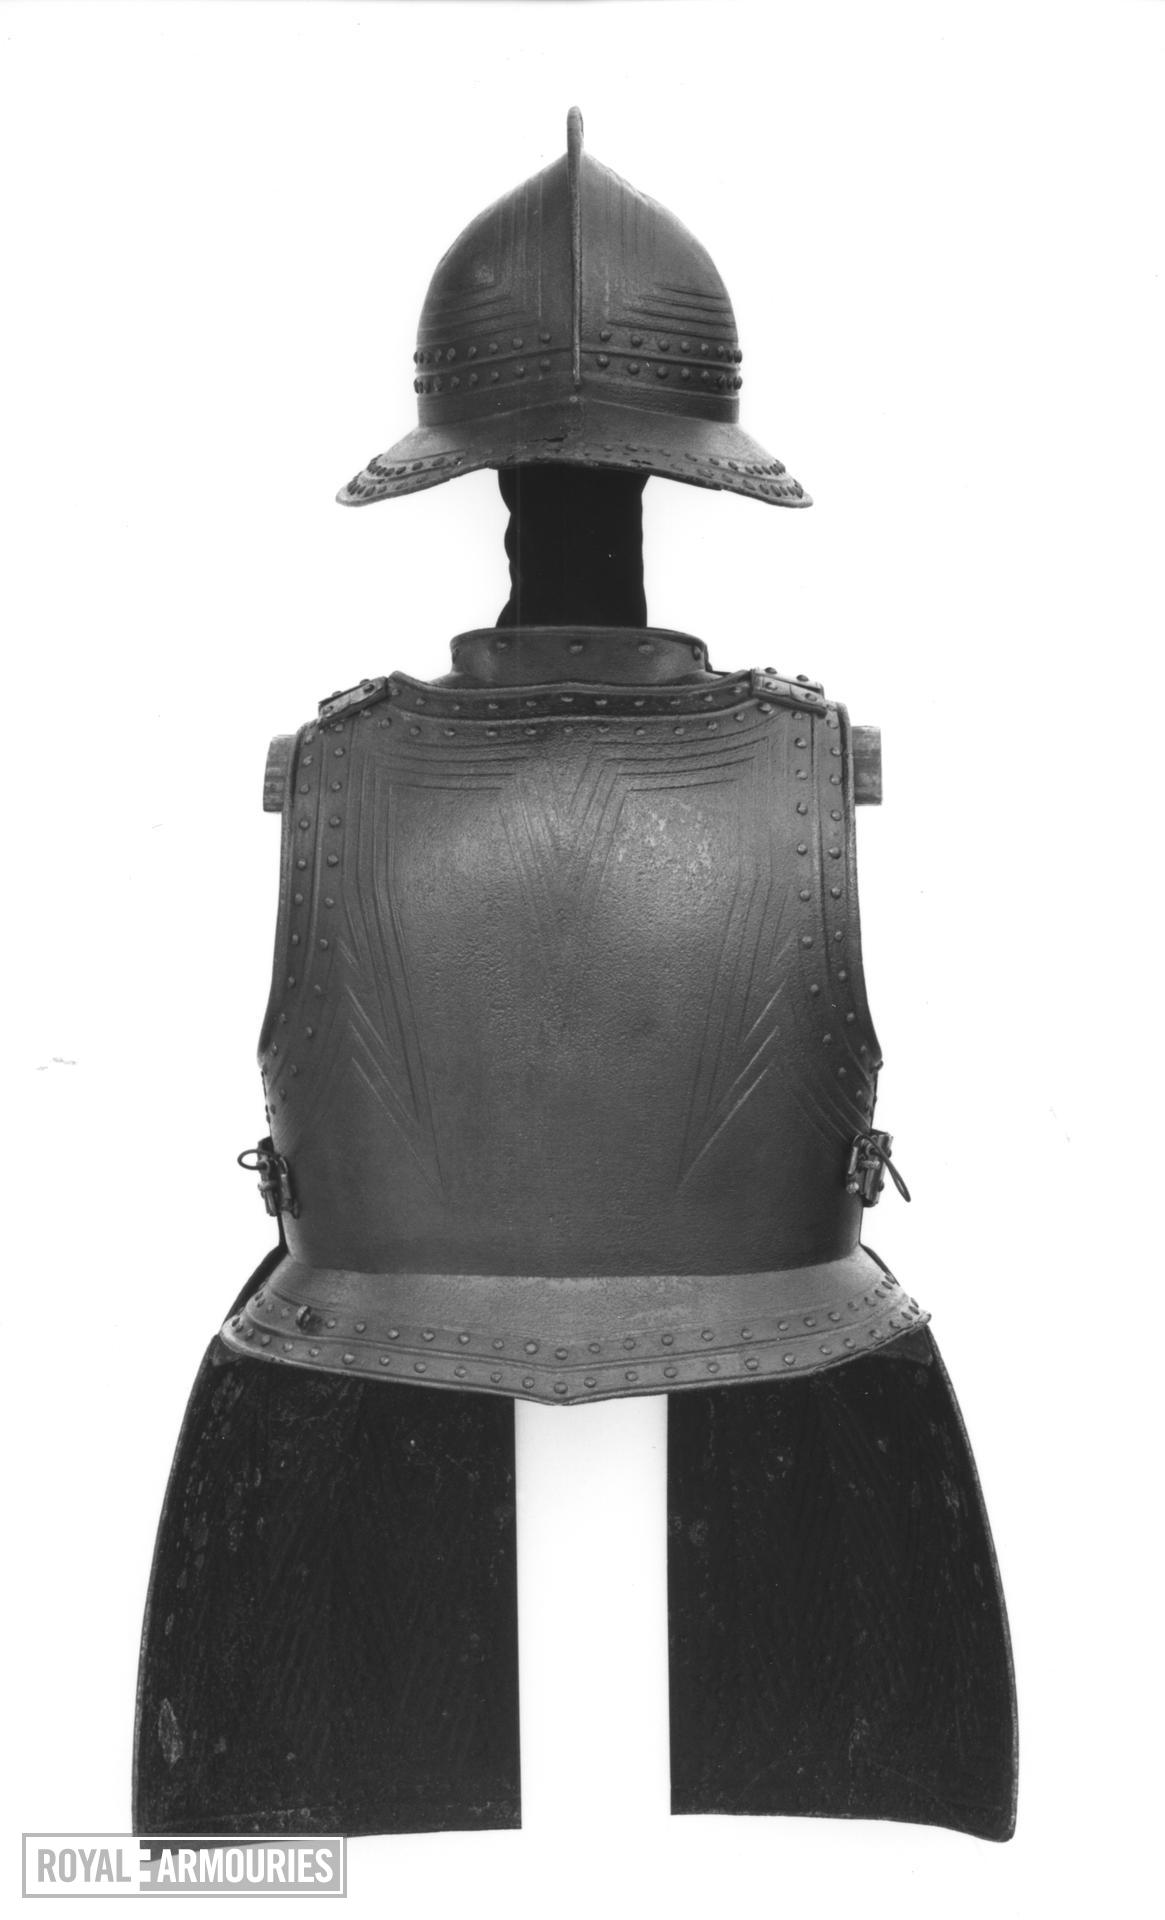 Pikeman's armour